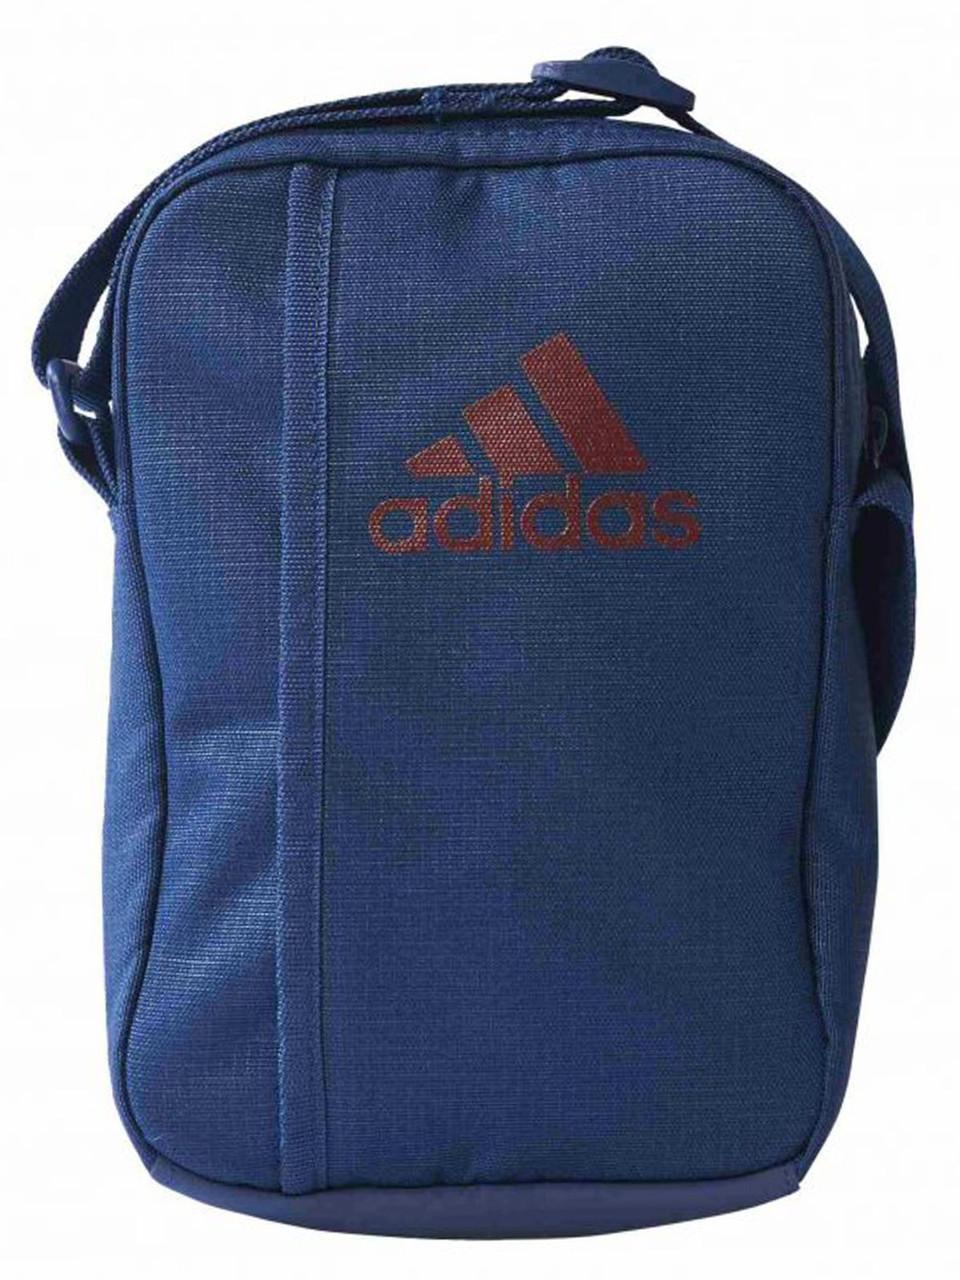 Сумочка Adidas 3S Per ORG M